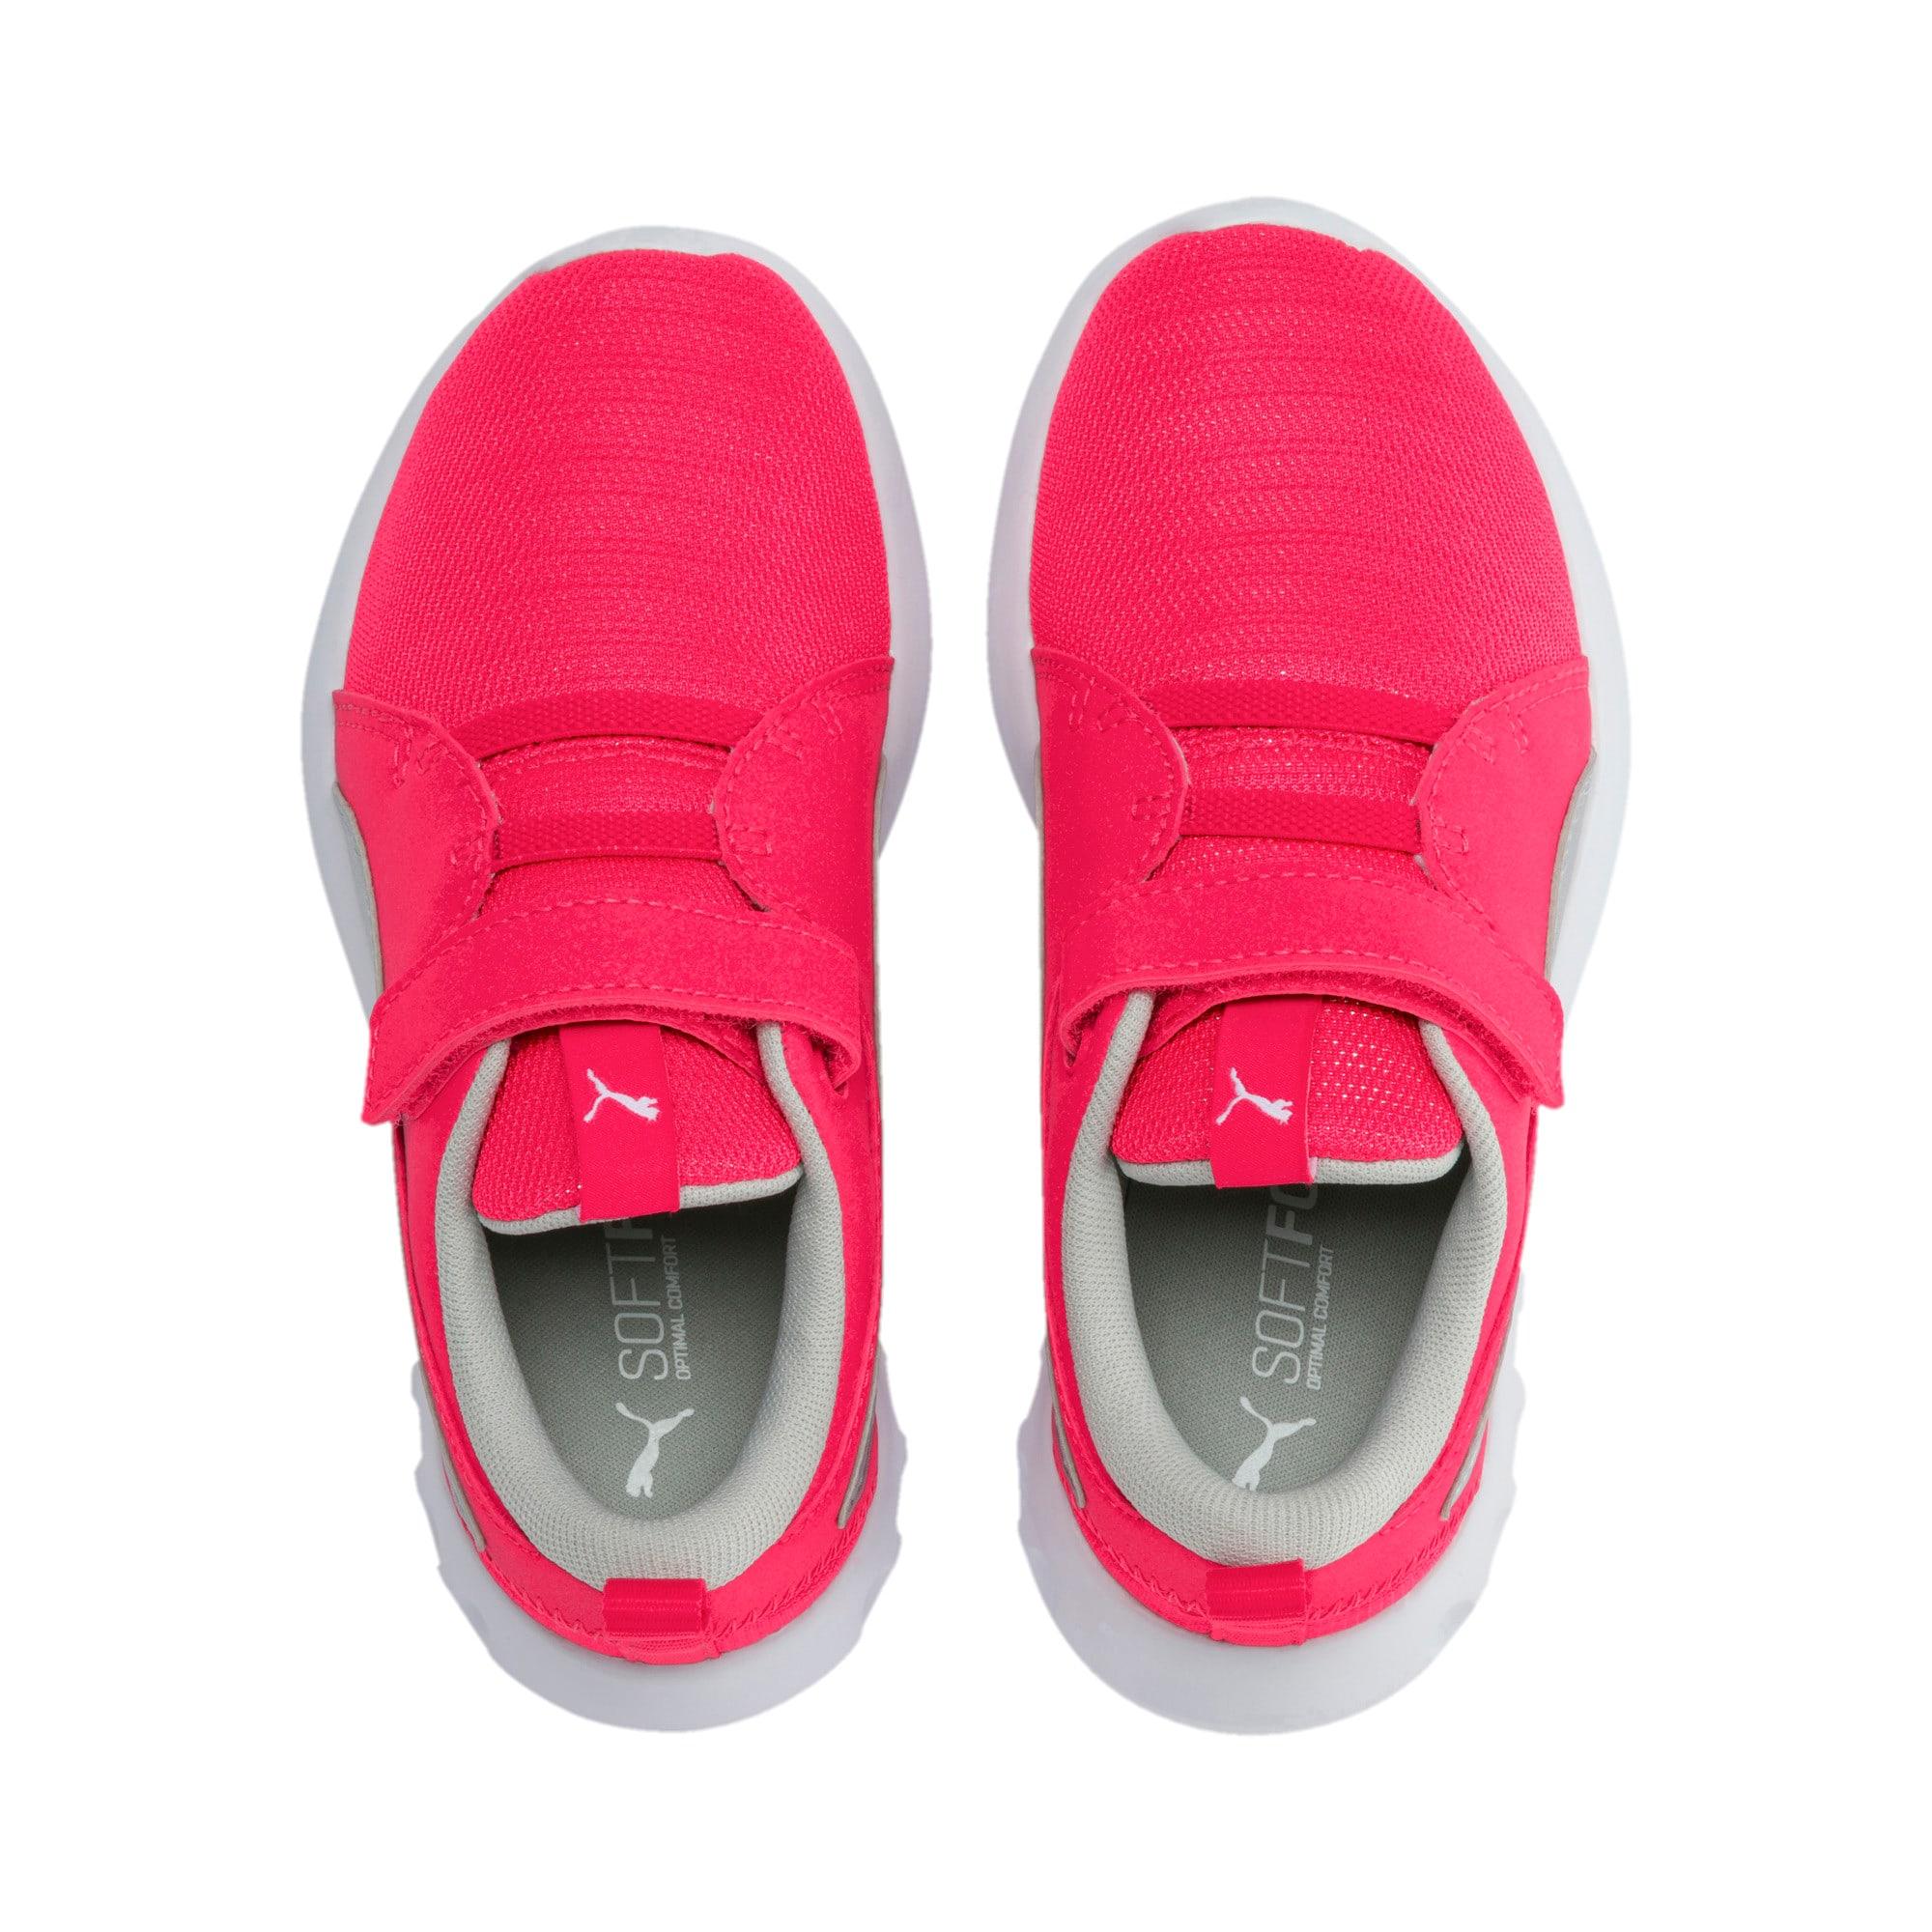 Thumbnail 6 of Carson 2 Glitz AC Shoes PS, Nrgy Rose-Silver, medium